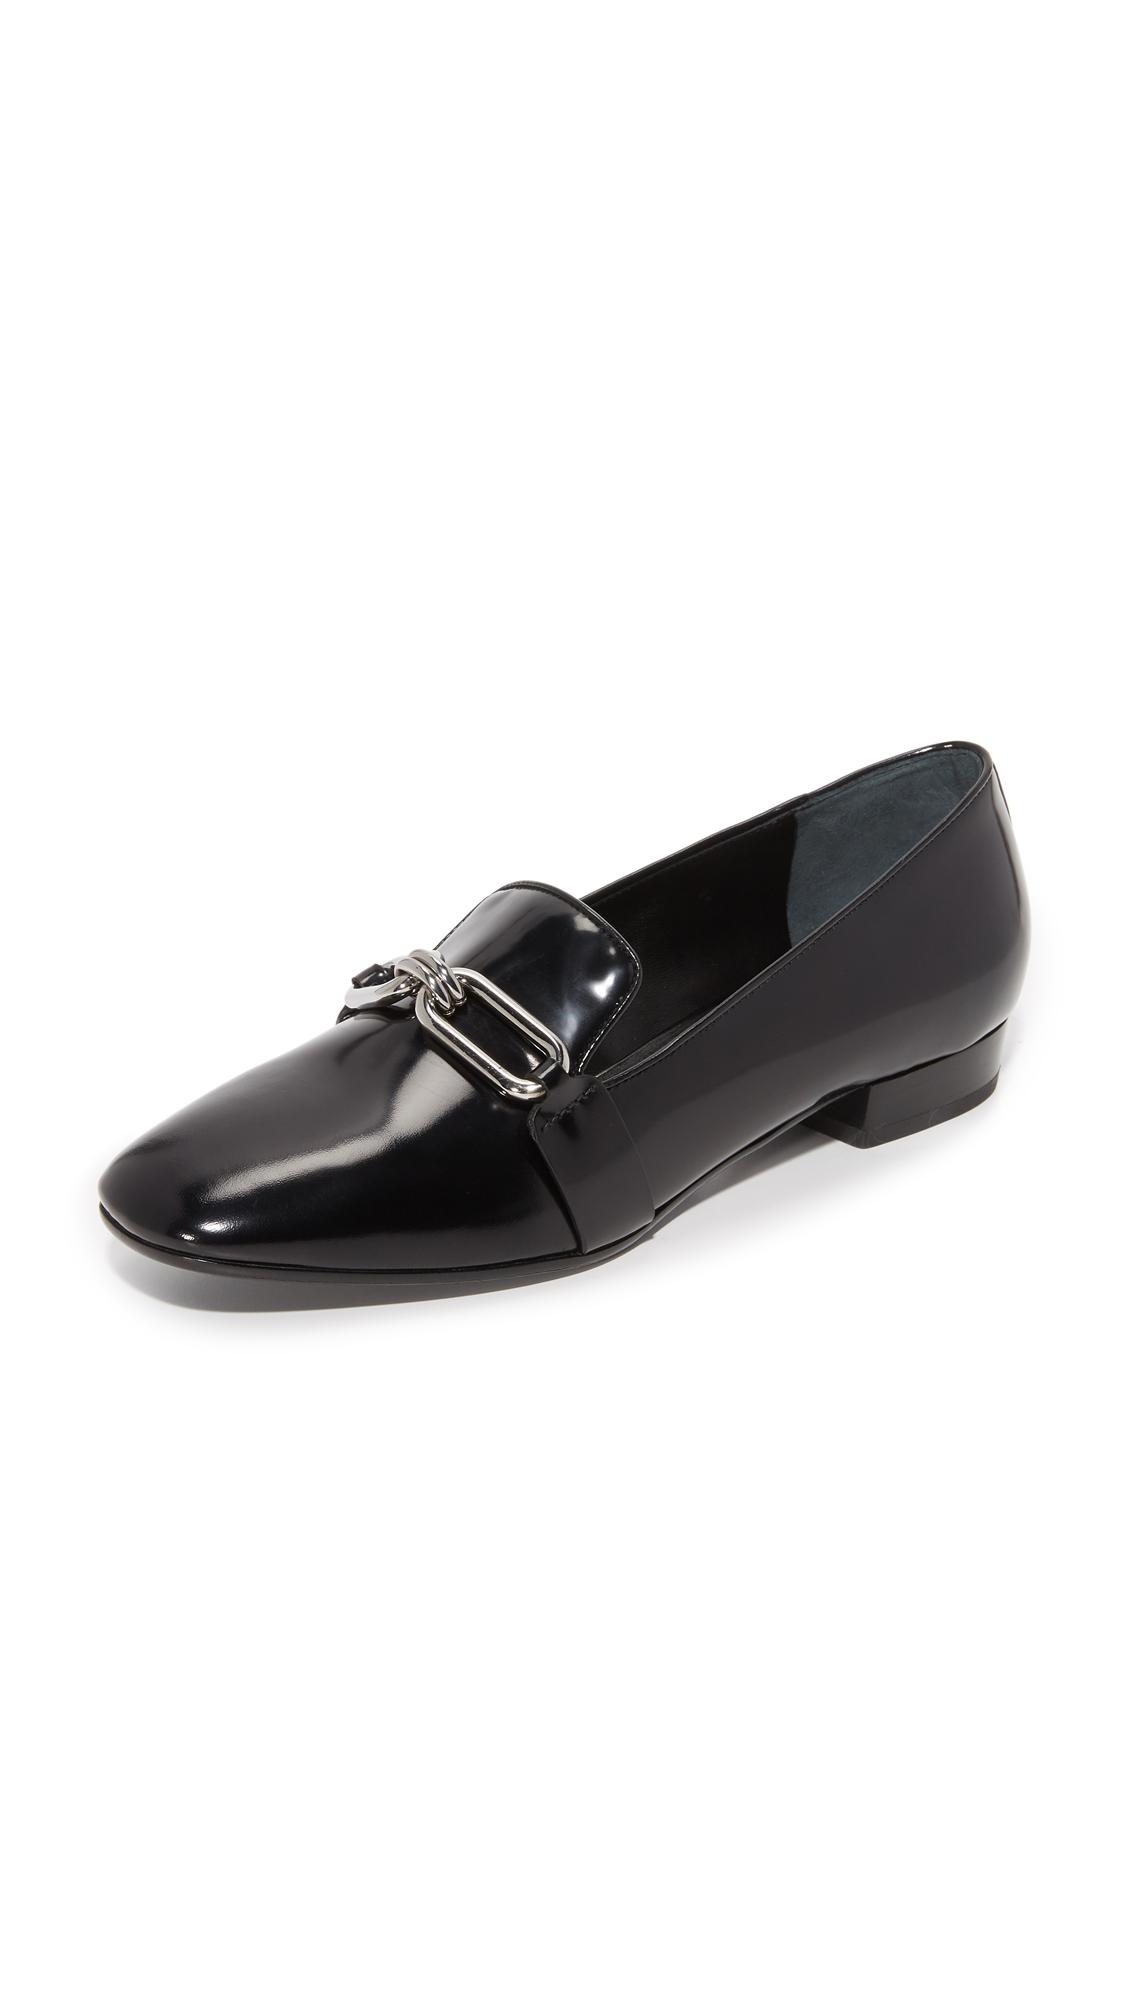 michael kors female 188971 michael kors collection lennox loafers black